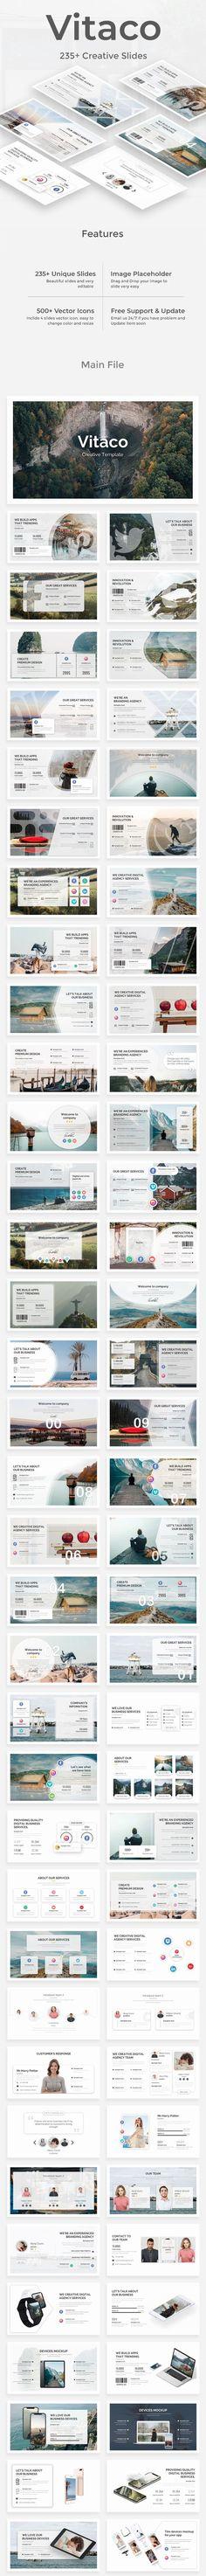 Vitaco Premium Google Slide Template. Google Slides template. #Google #Presentation #PresentationTemplate #slides #PitchDeck #StartupPitch #analysis #animated #brief #business Presentation Slides, Business Presentation, Presentation Templates, Slide Template, Creative Powerpoint Templates, Keynote Template, Pitch, Tenses Chart